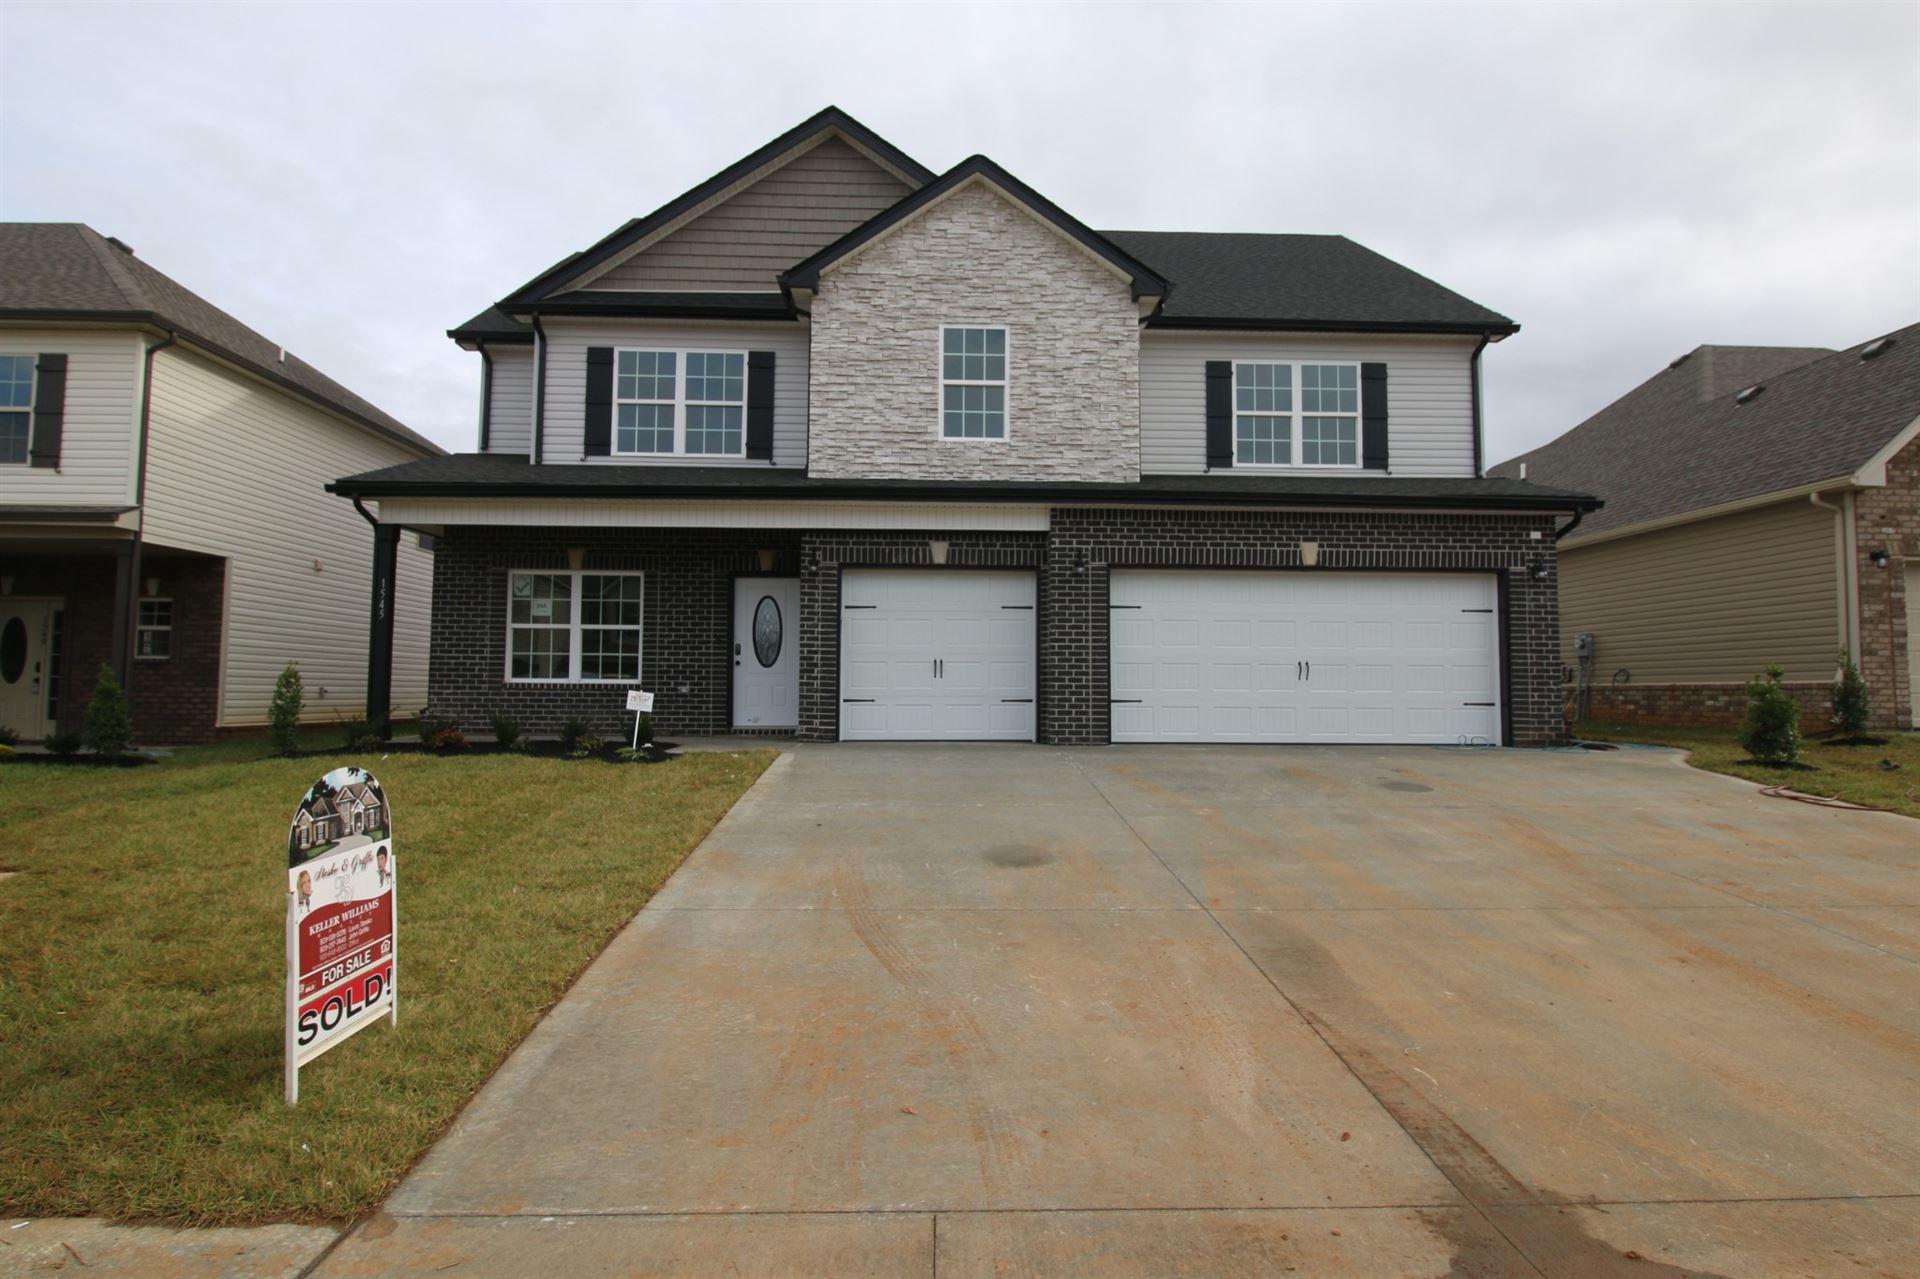 384 Summerfield, Clarksville, TN 37040 - MLS#: 2292165